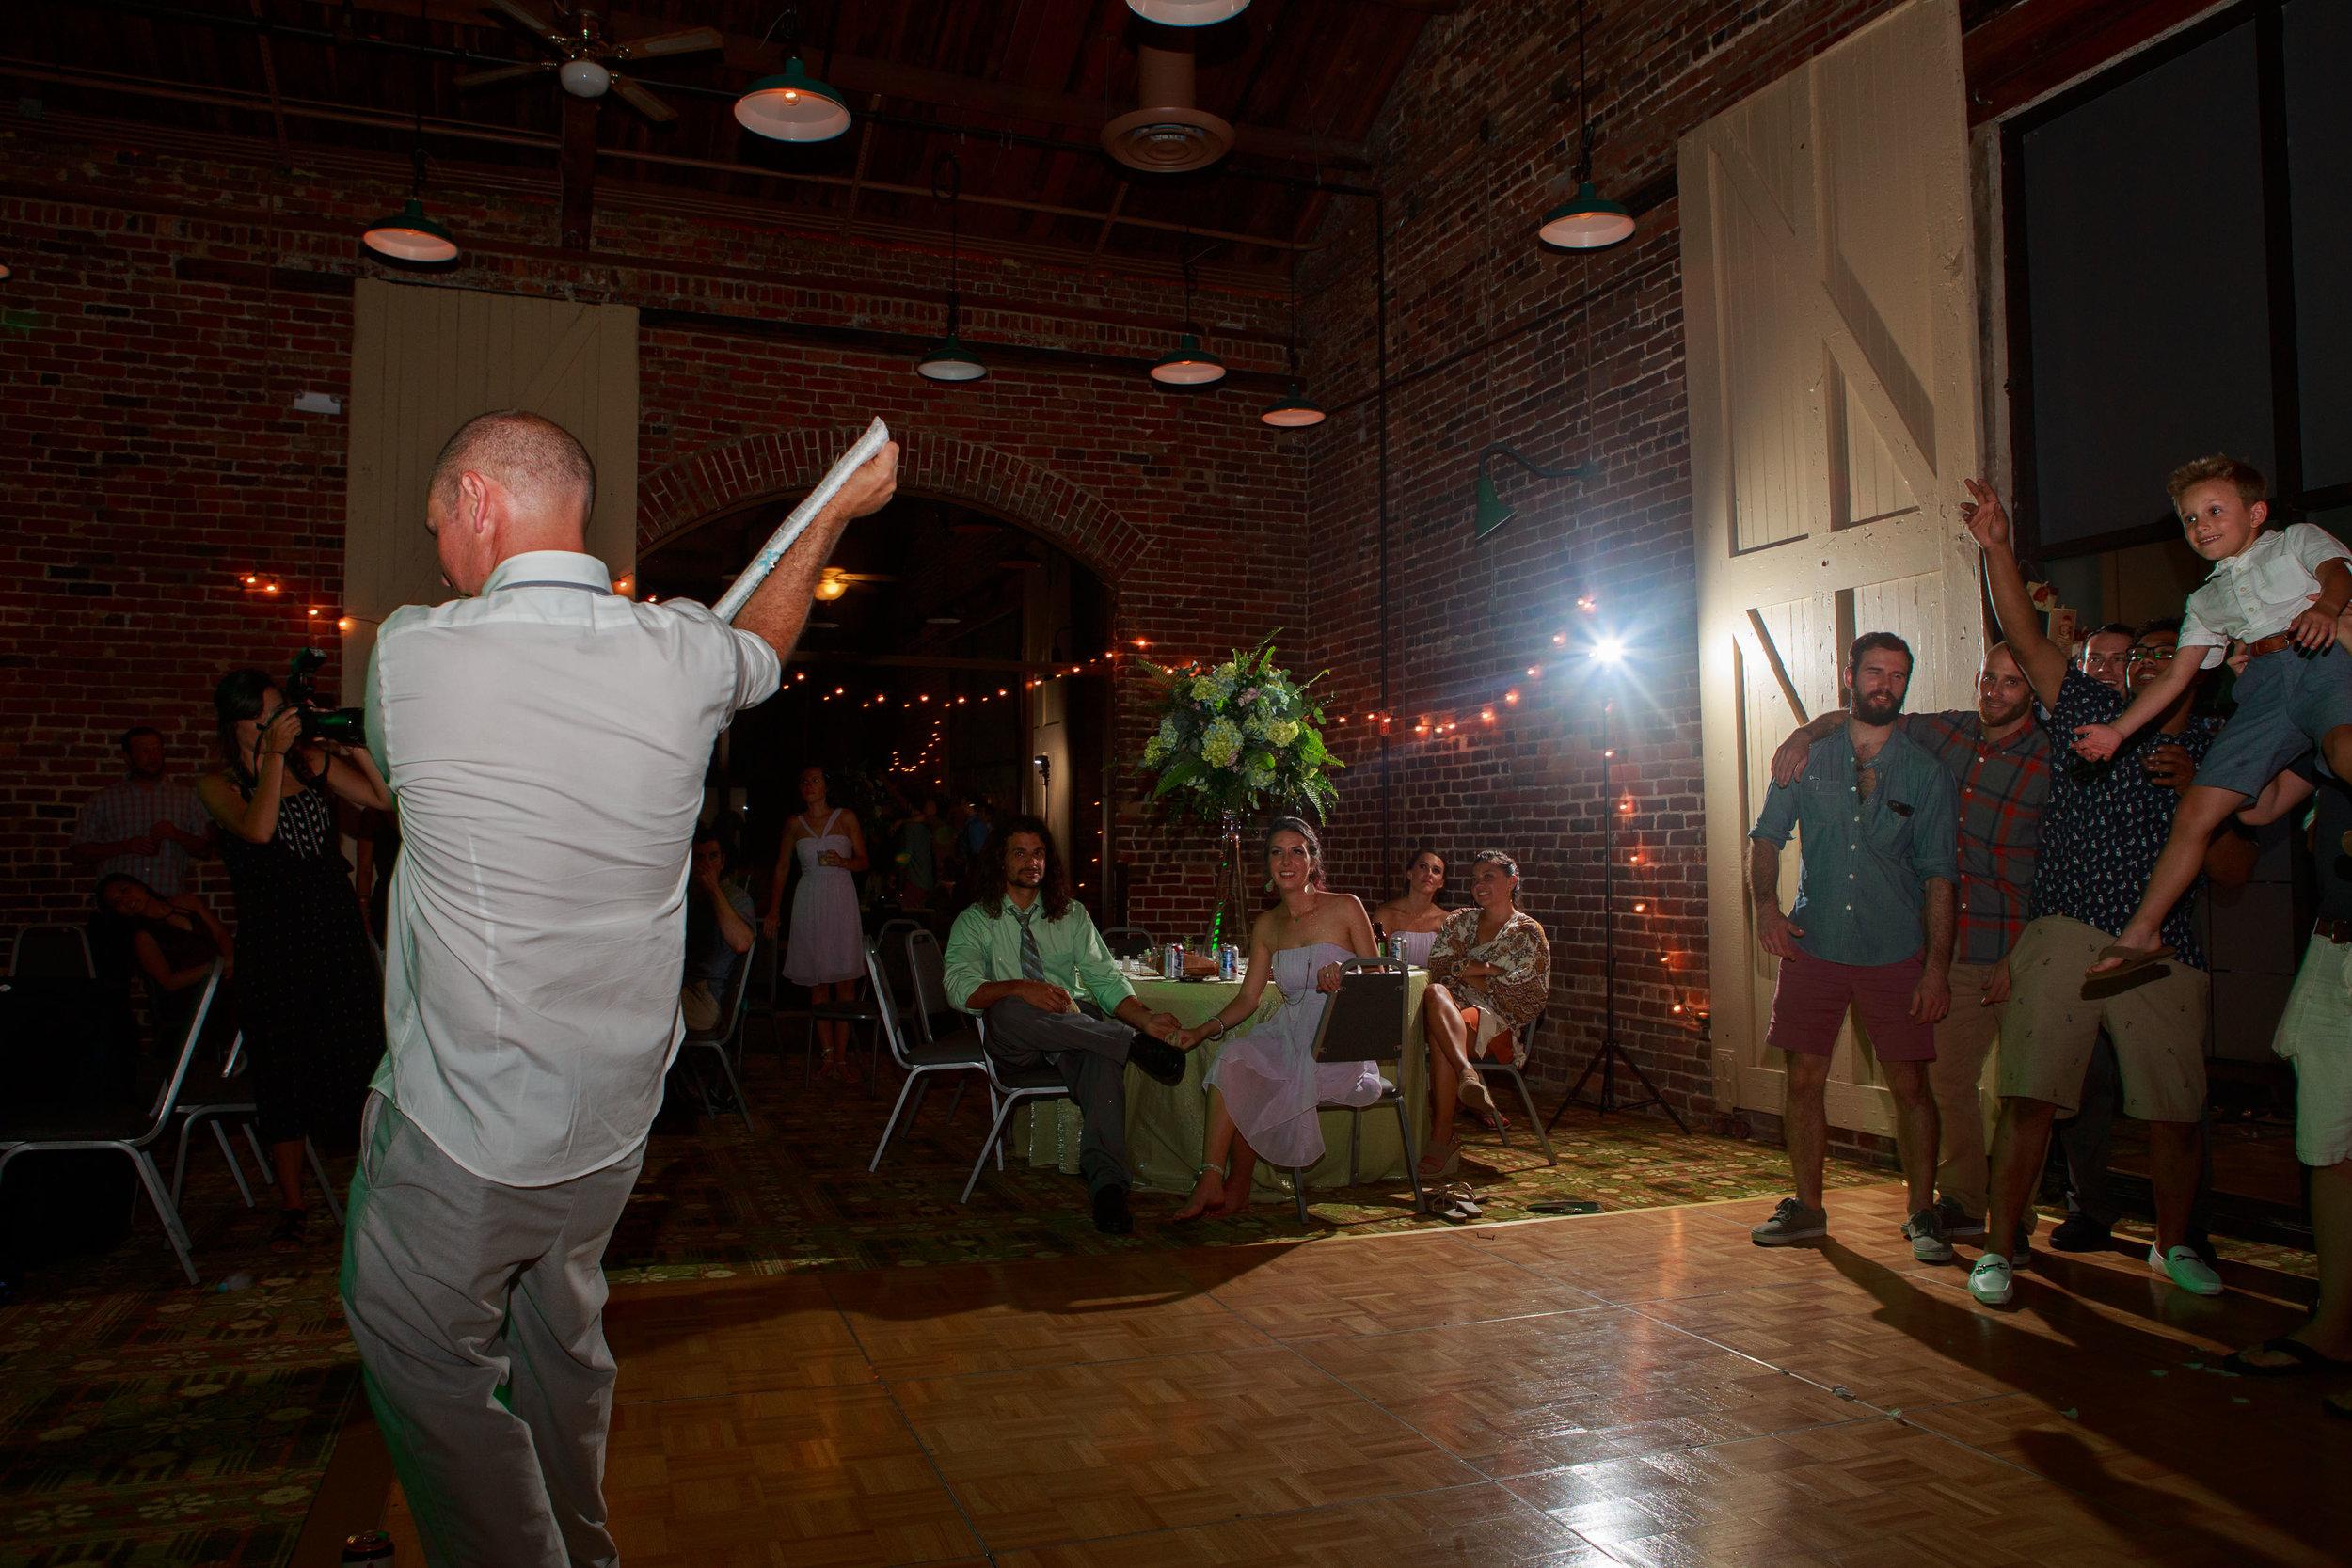 North_Carolina_Wedding_Photographer_Tiffany_Abruzzo_Reception_297.jpg